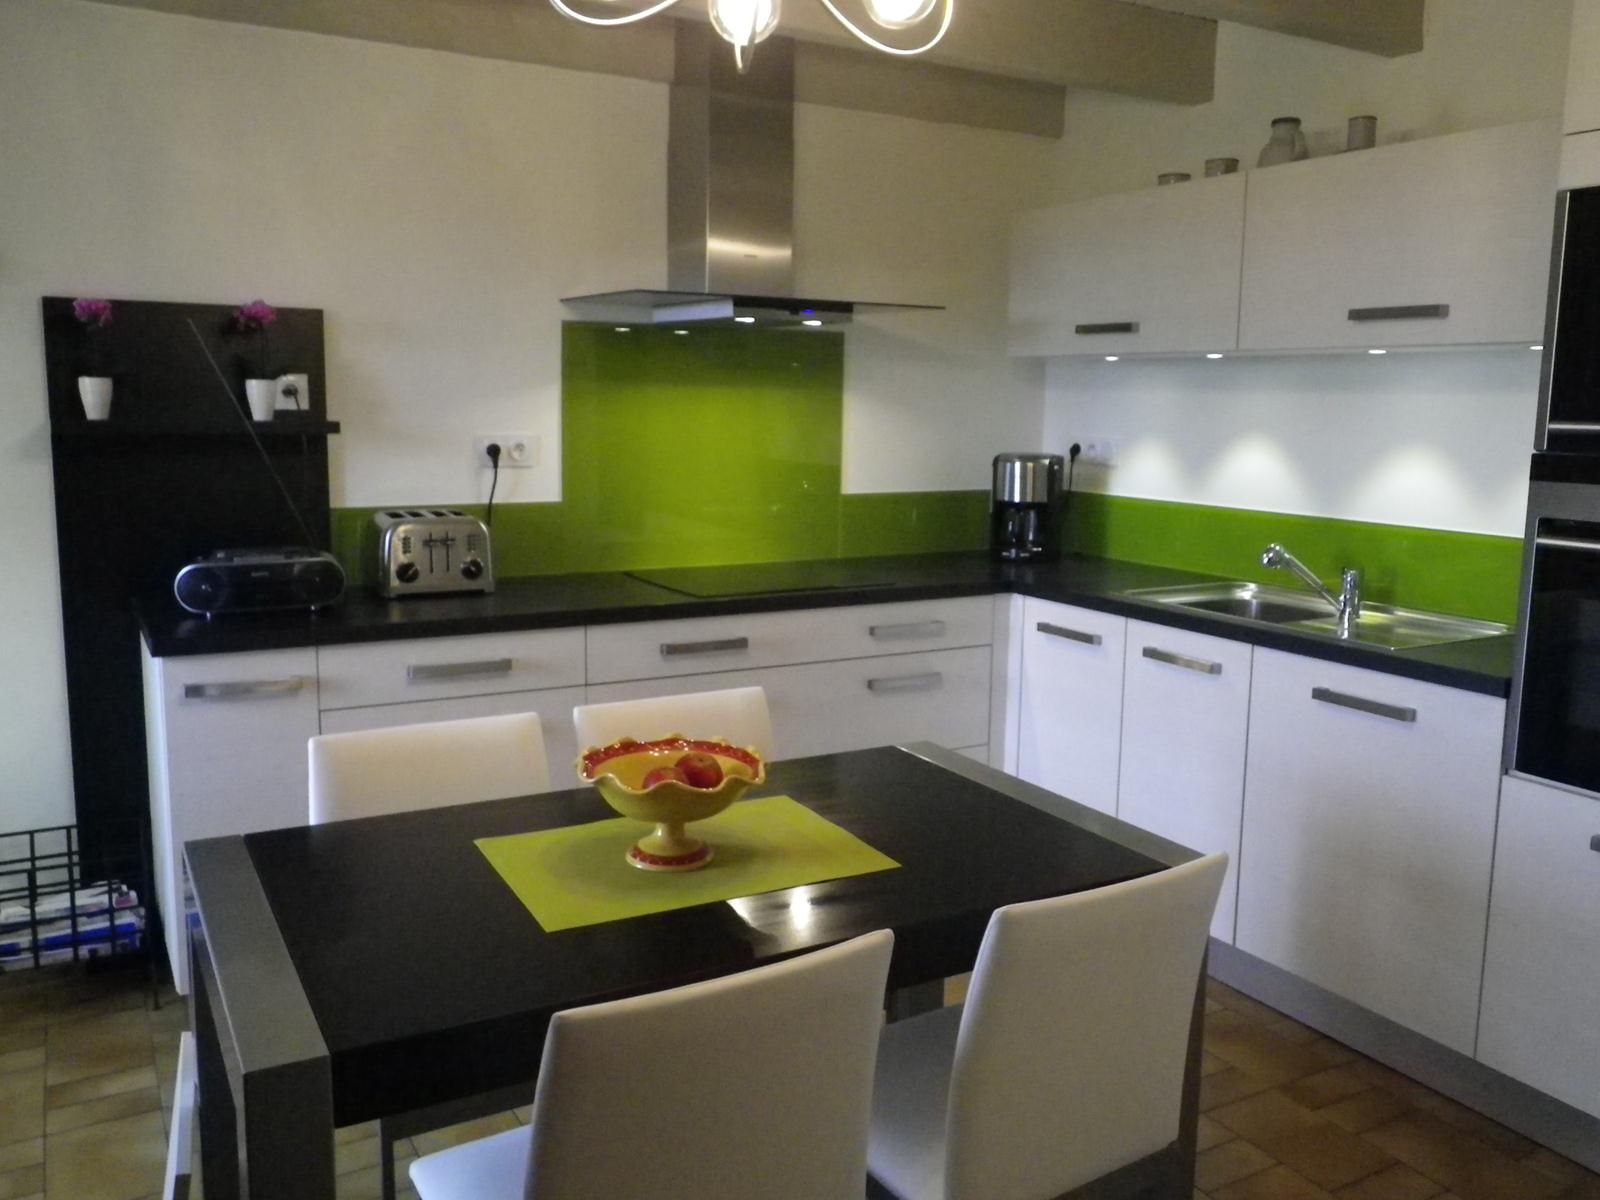 foto-diseno-cocinas-modernas-verde-y-blanco-18.jpg (18×18)  Keuken